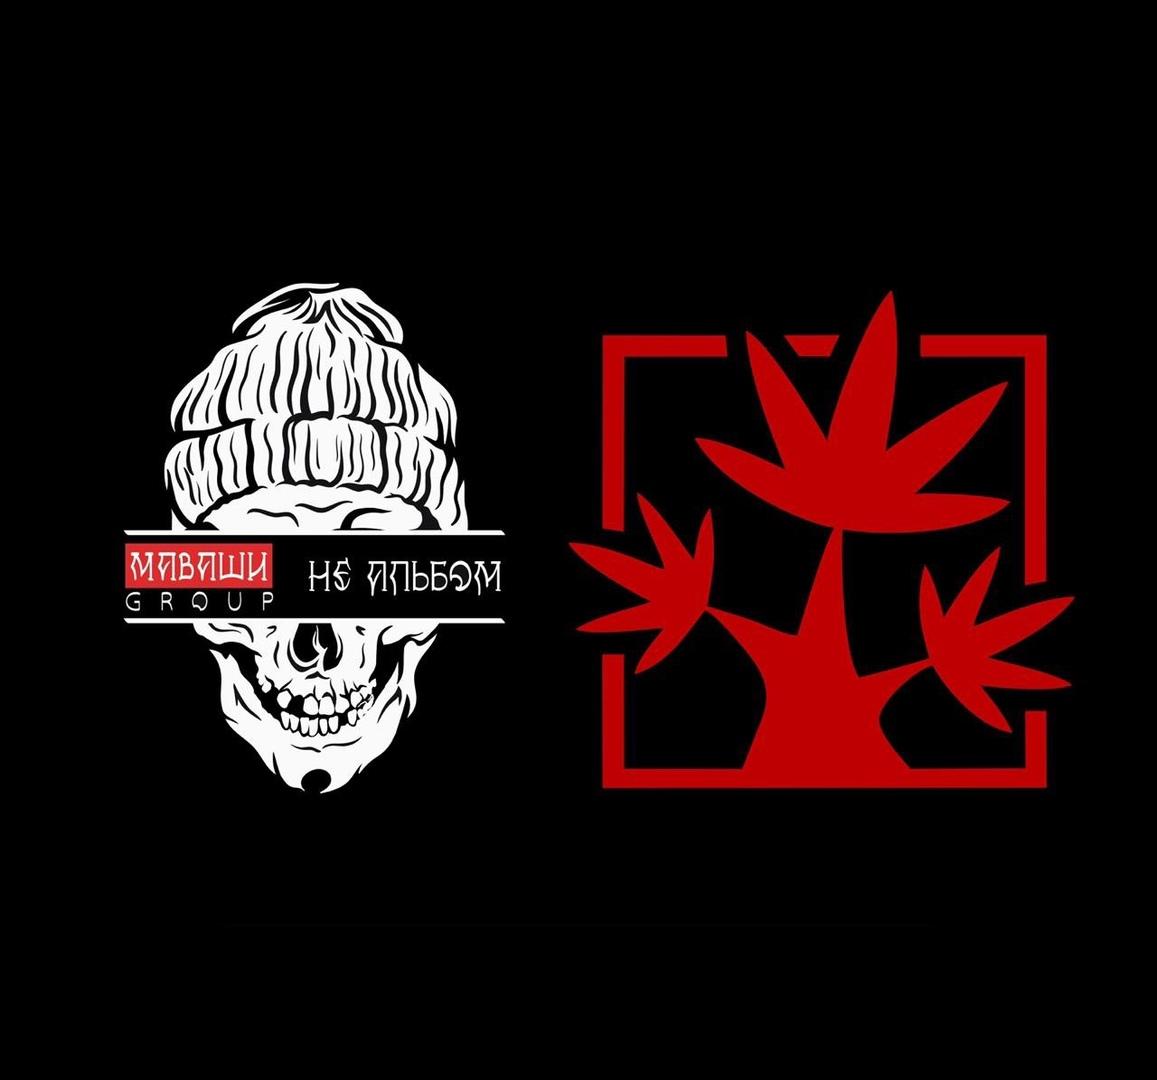 Маваши group feat. Красное Дерево «От хулигана до мужчины»